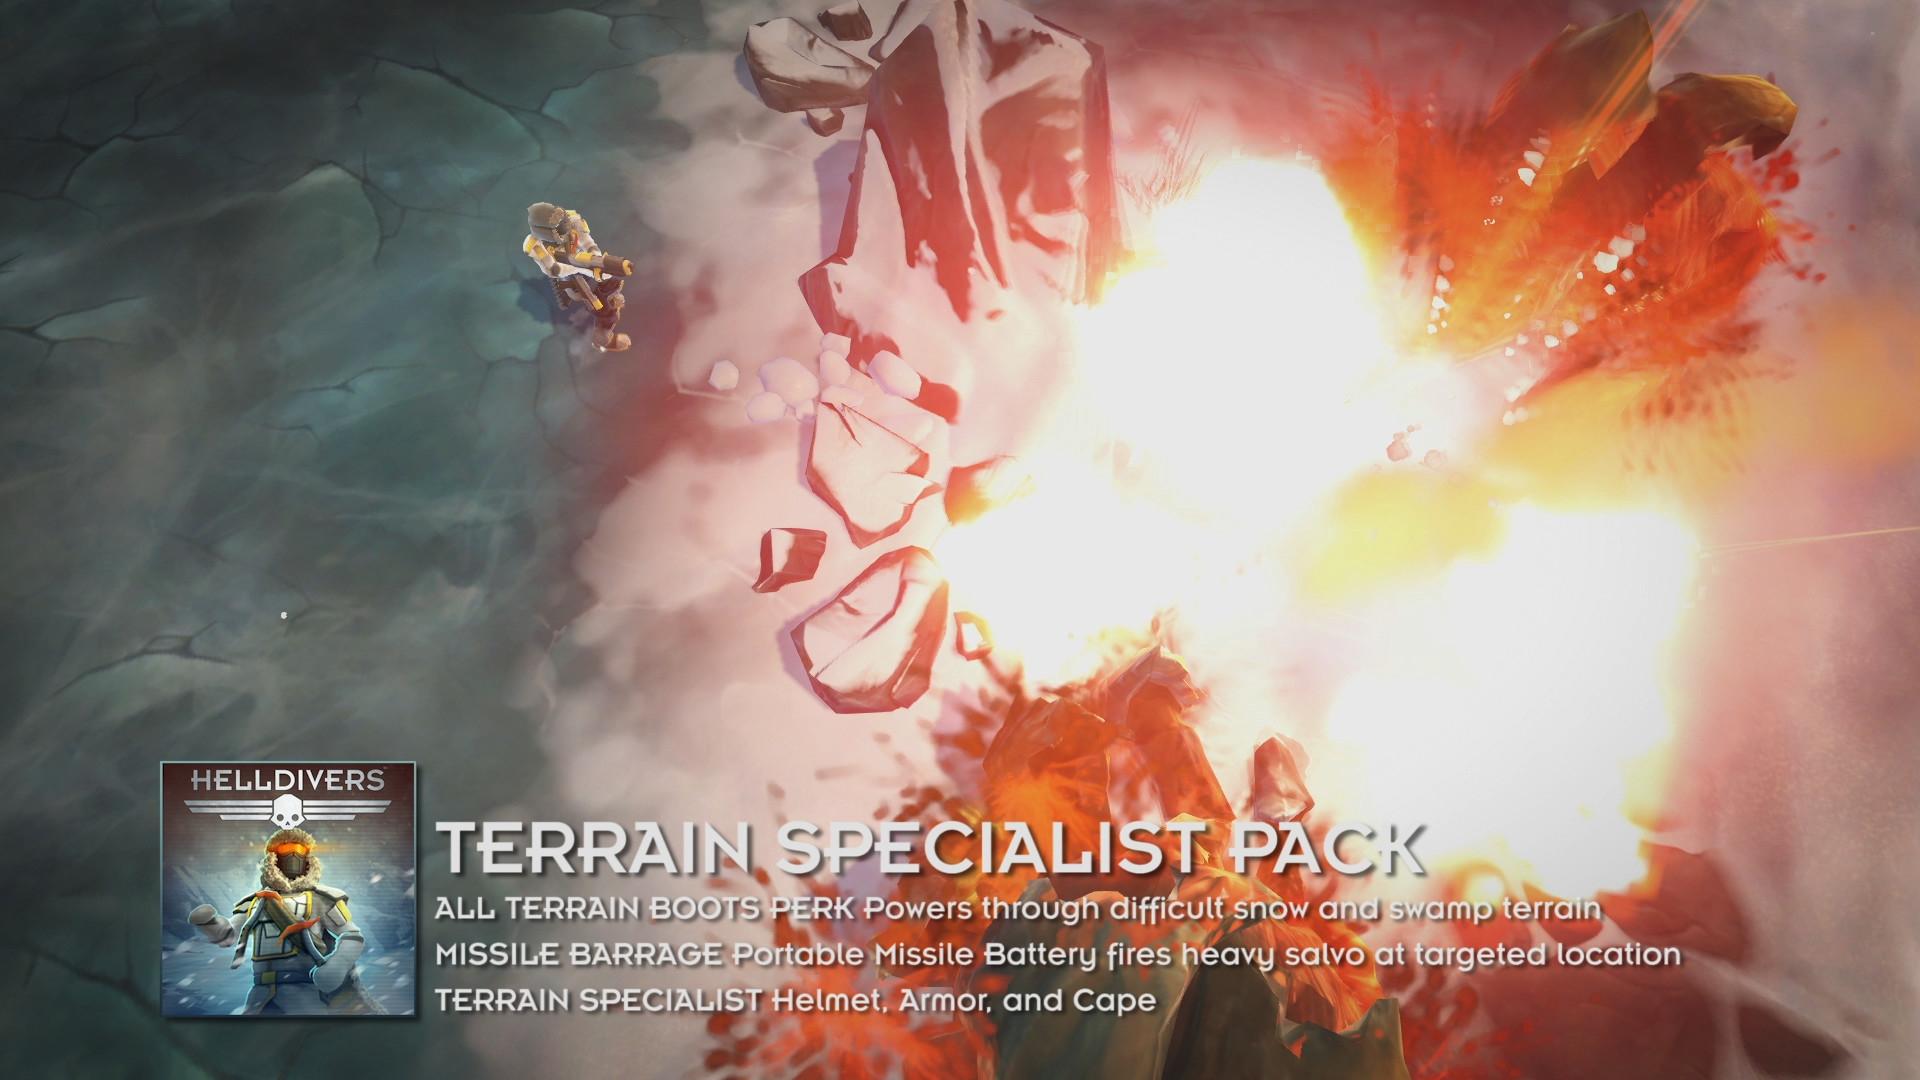 HELLDIVERS™ Terrain Specialist Pack   WW (6c02fa31-a31a-4a72-9794-056beb0eeb5c)